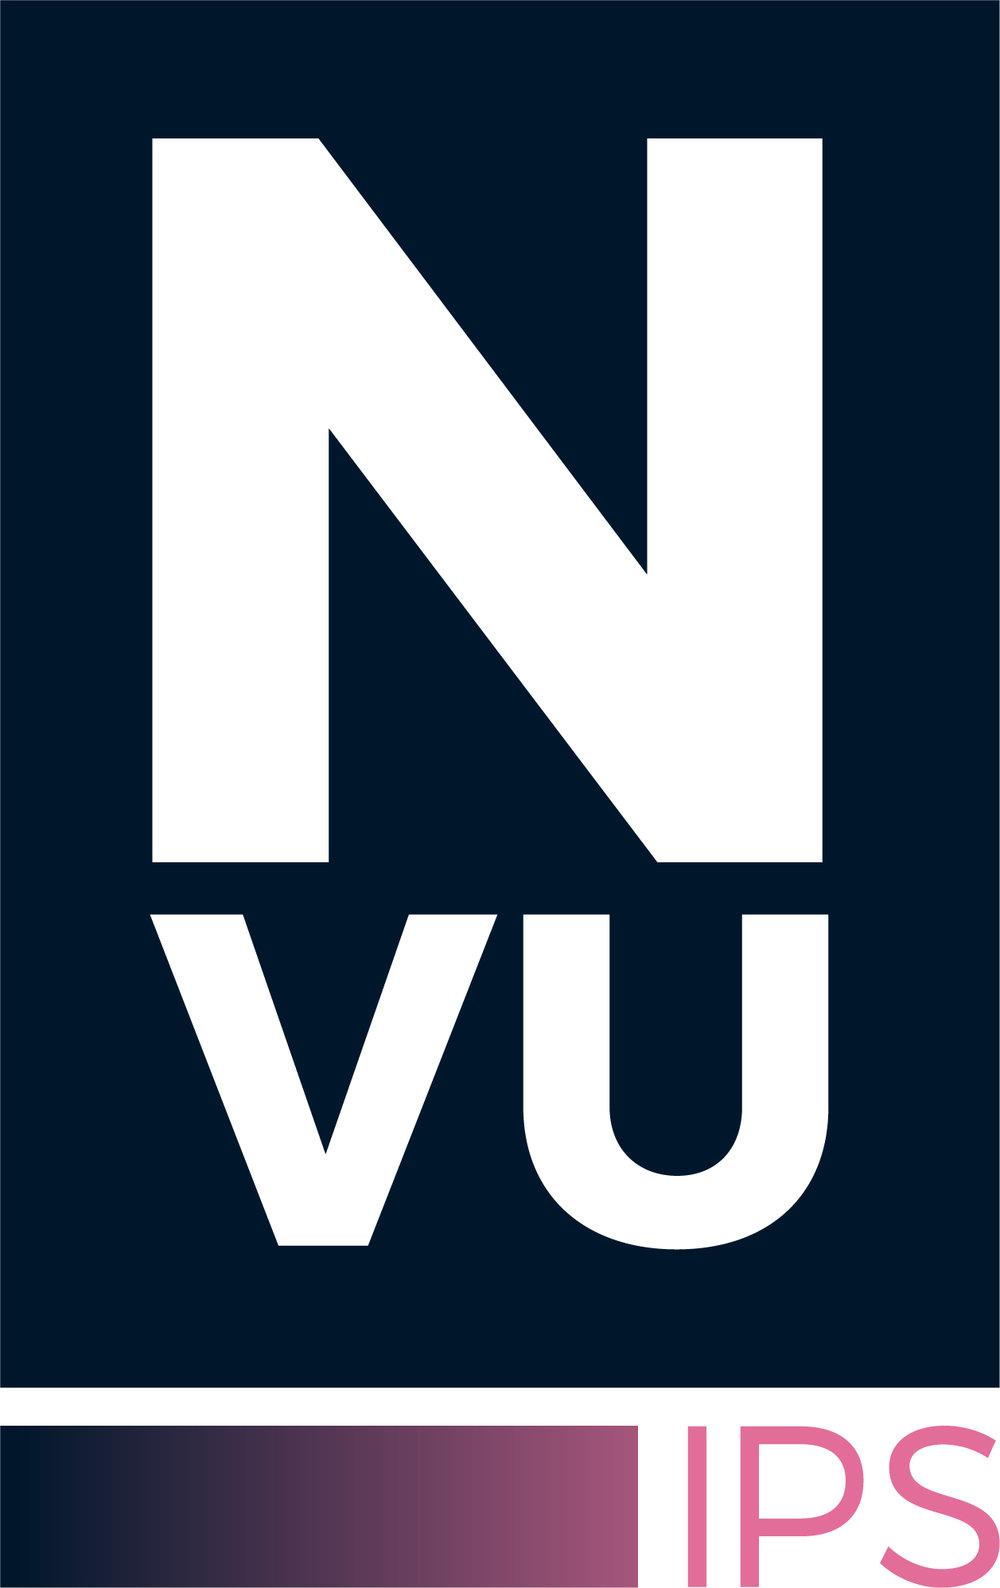 nvu_ipslogo_navy@4x-100 (1).jpg